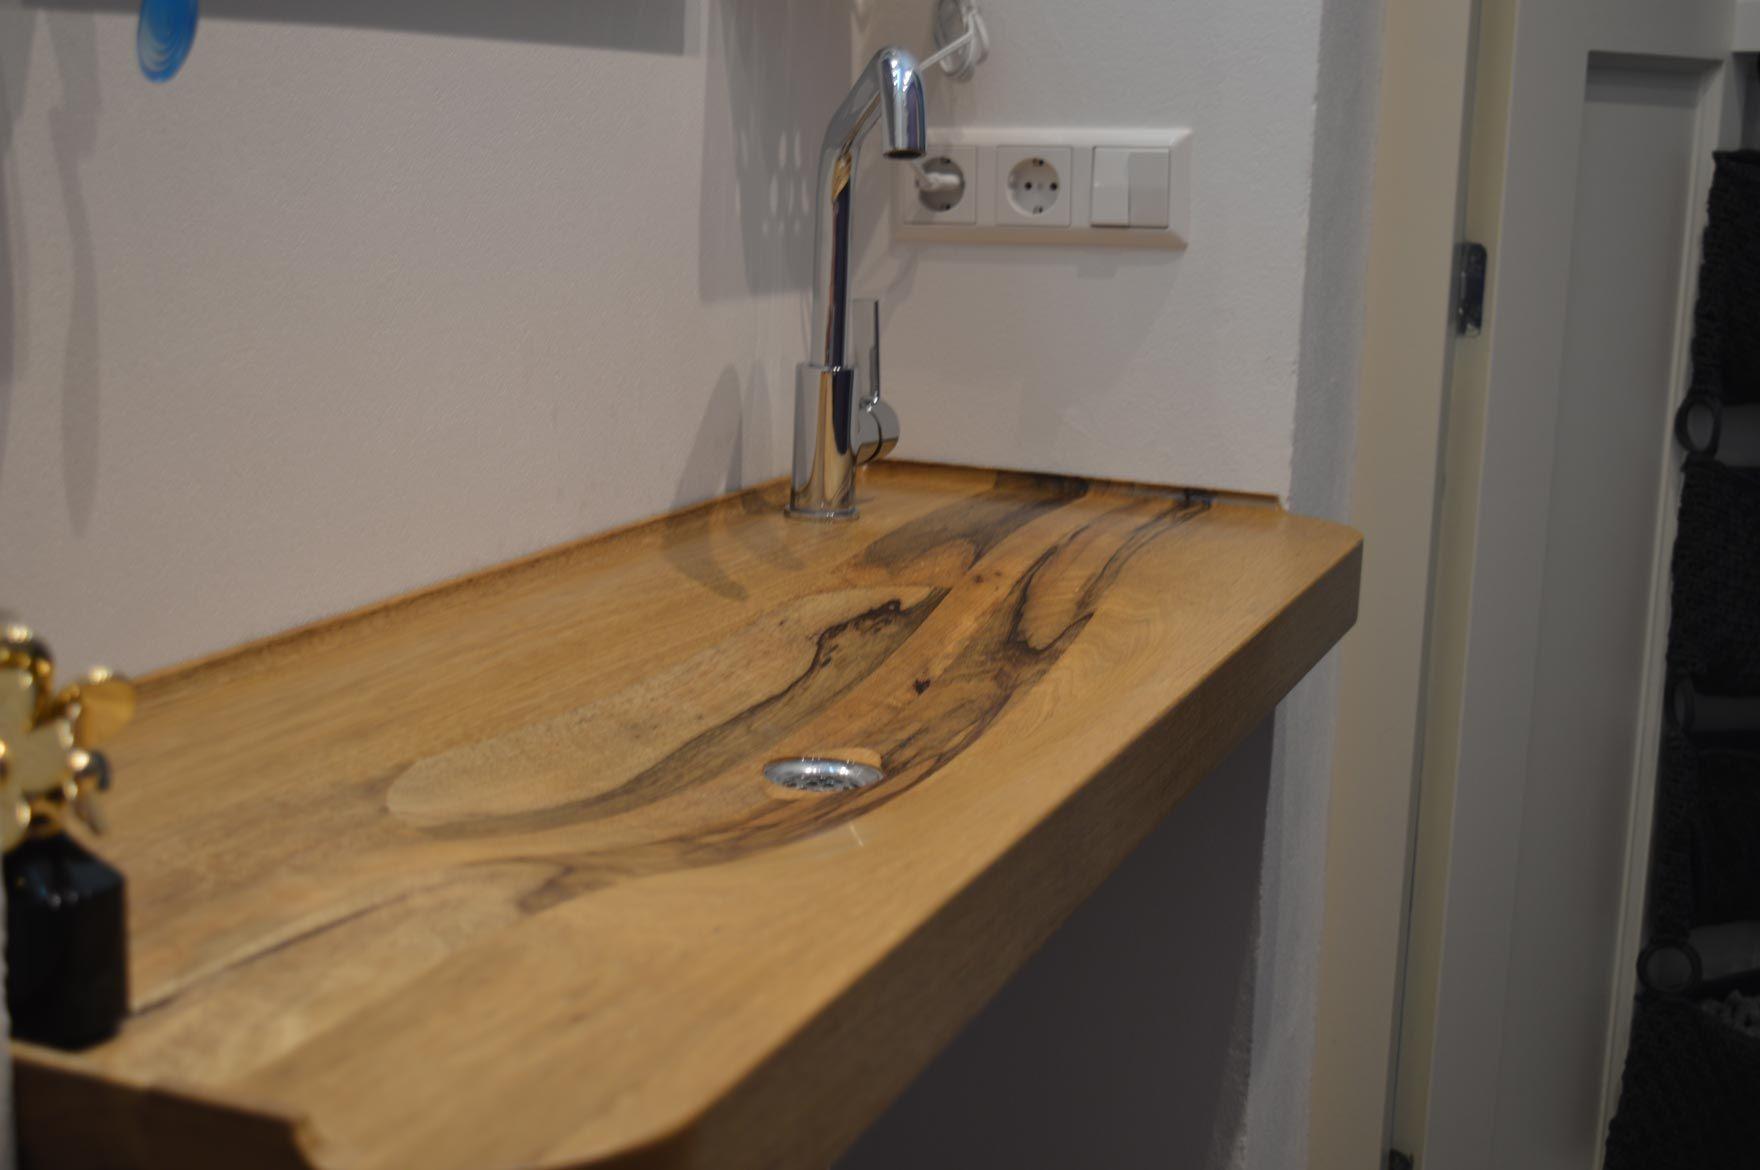 Wasbak 1 Meter : Wasbak op maat voor kleine badkamer na badkamer